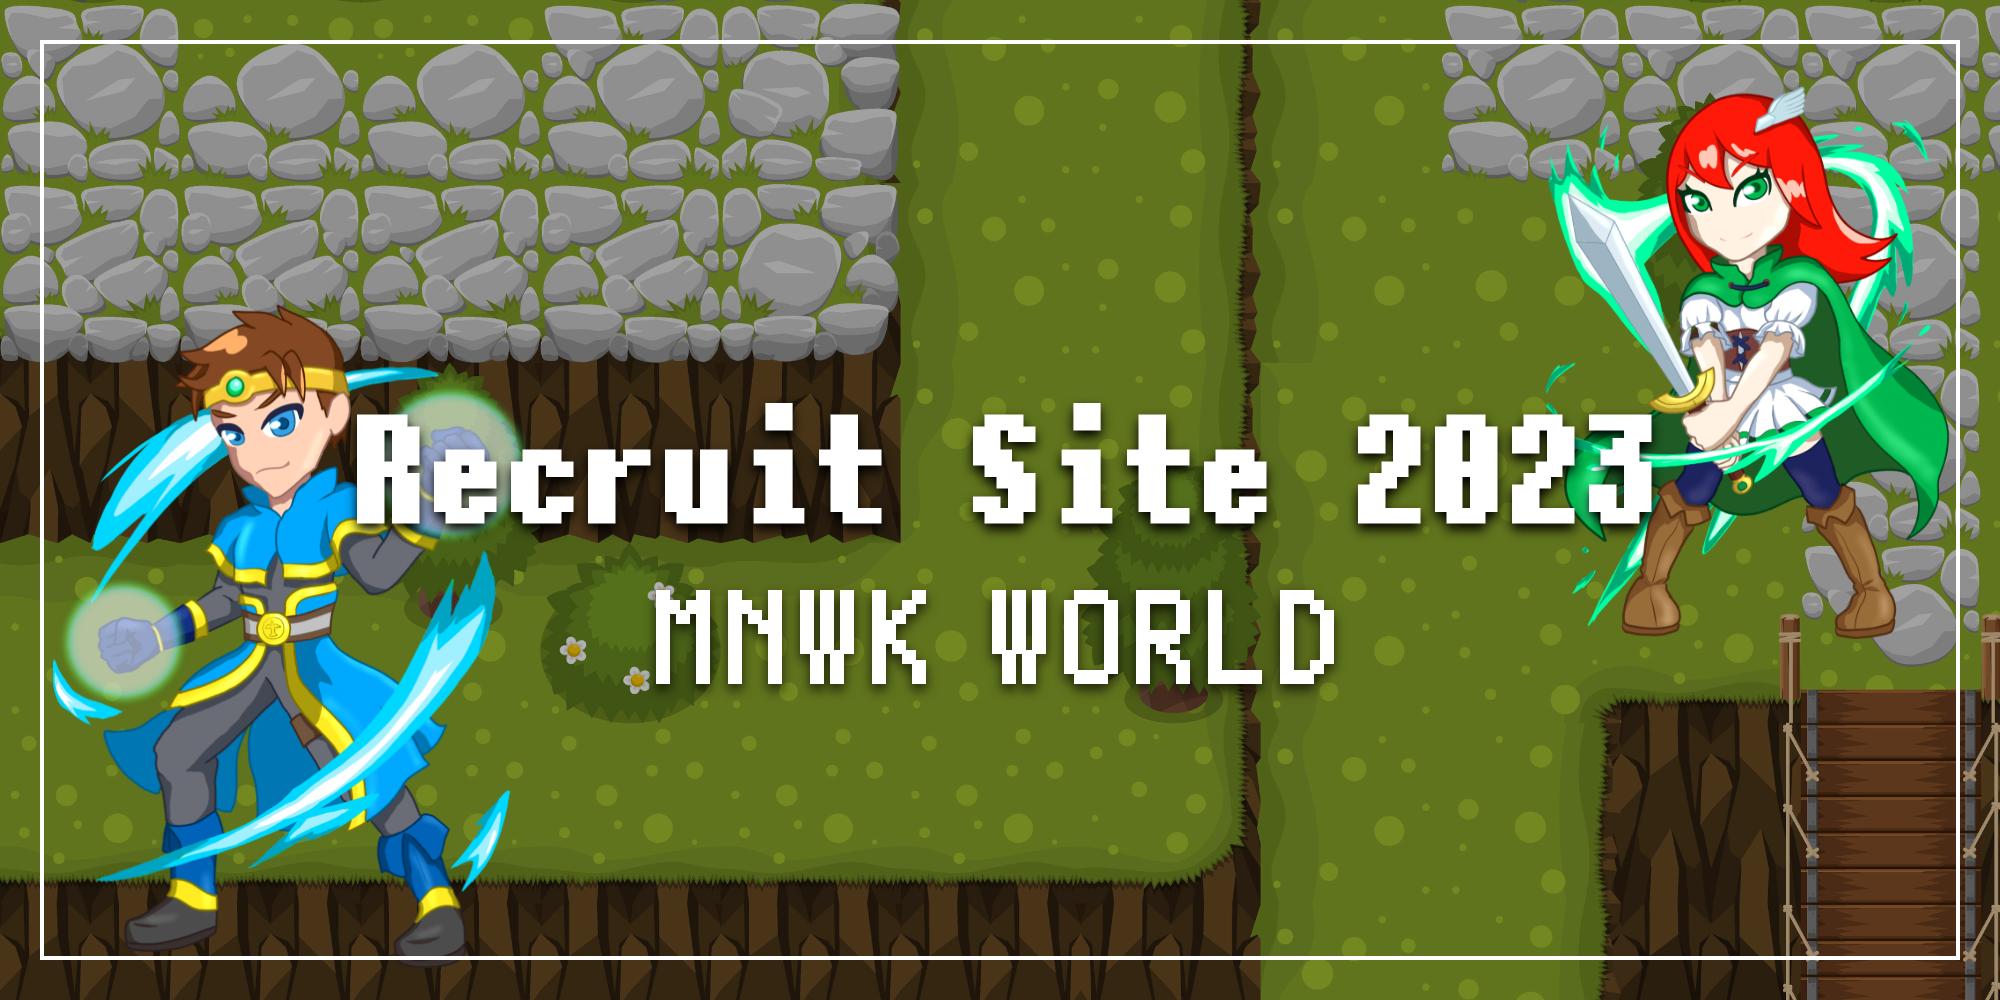 Recruit Site 2023 MNWK WORLD